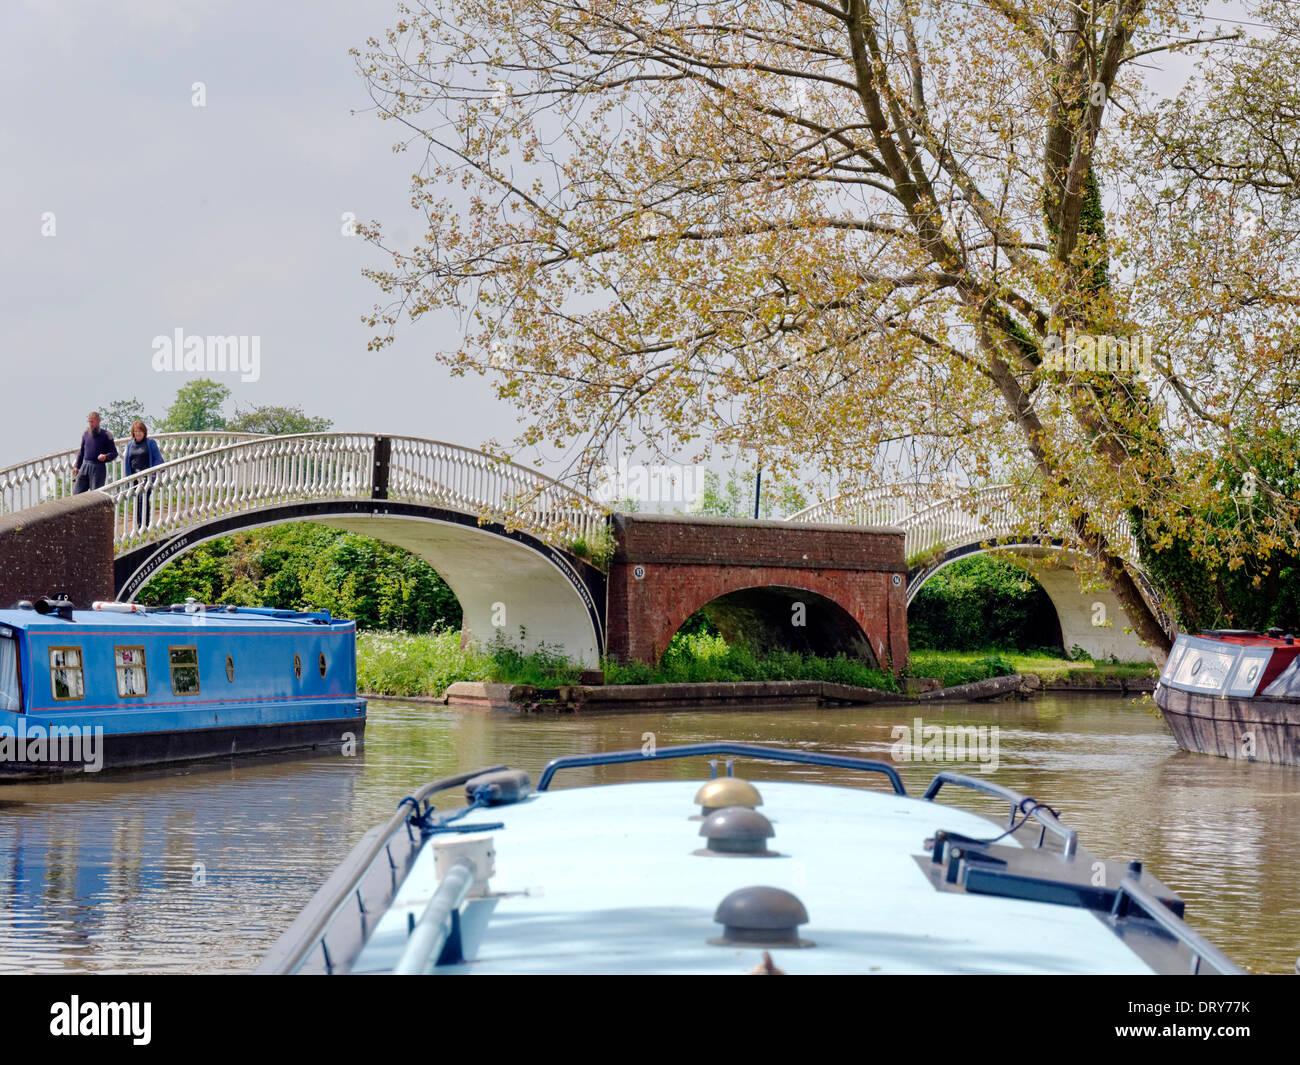 Canal Bridges - Stock Image